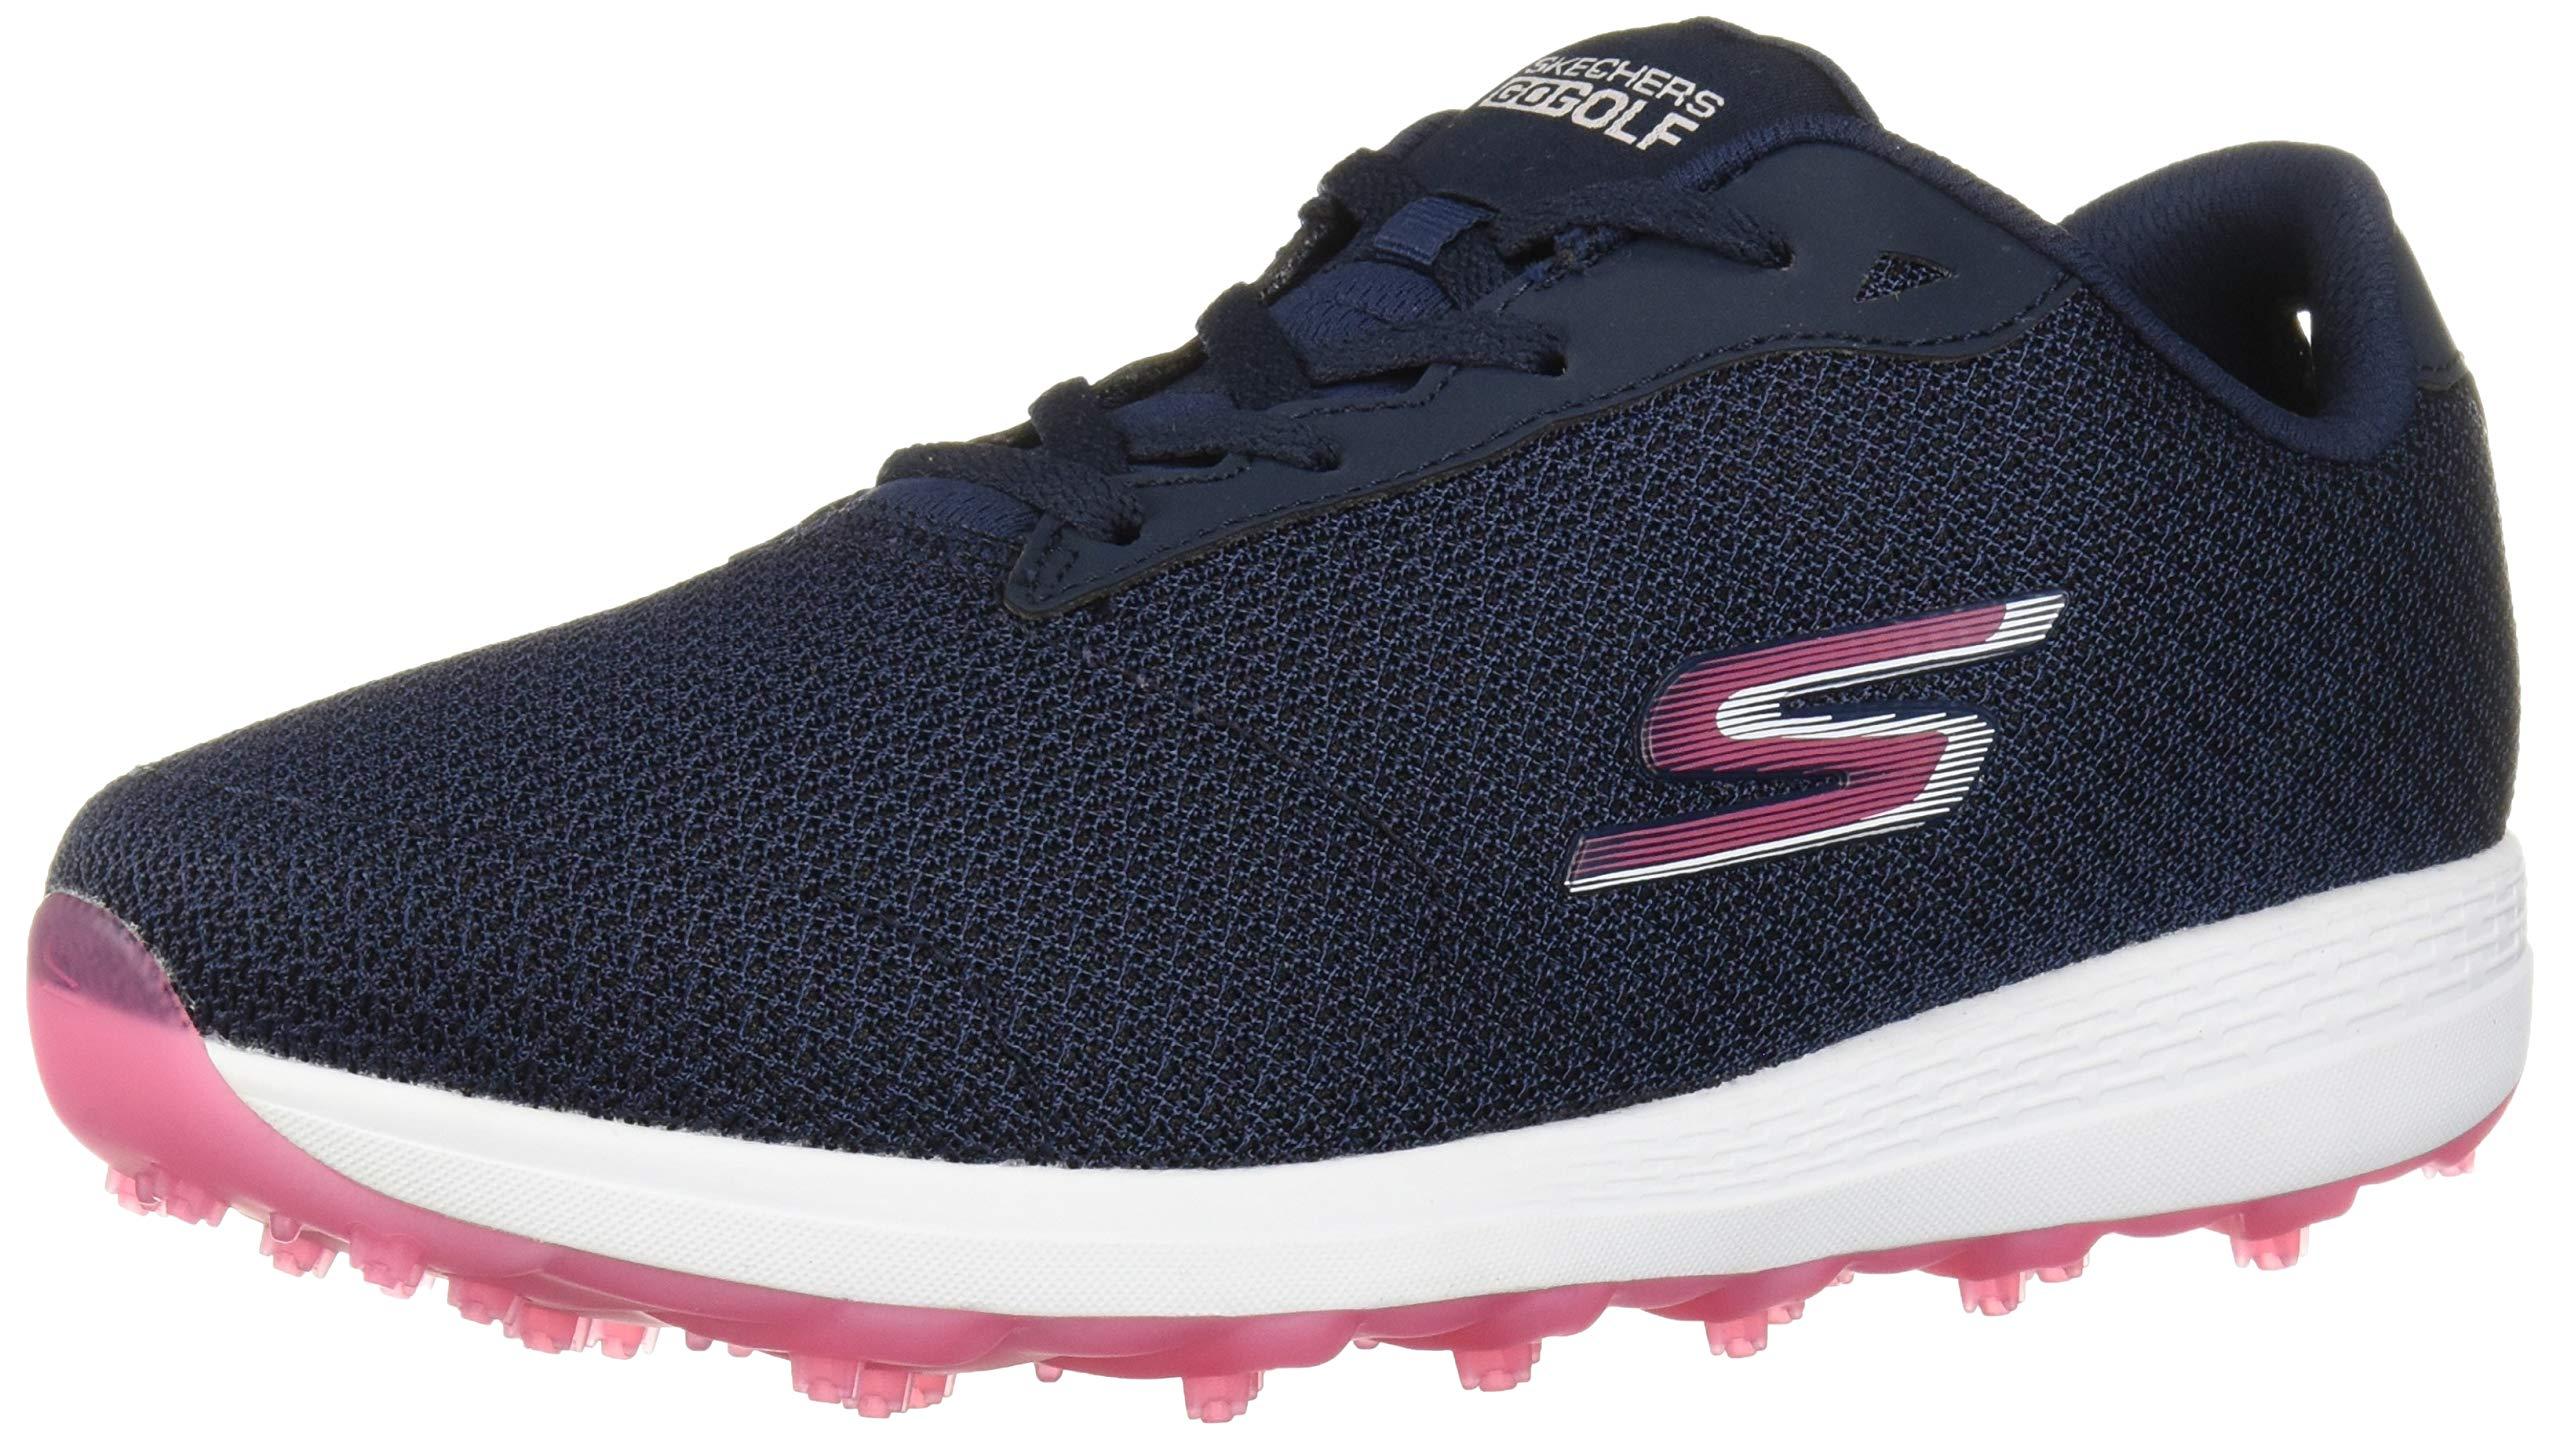 Skechers Women's Max Golf Shoe, Navy/Pink Textile, 8.5 W US by Skechers